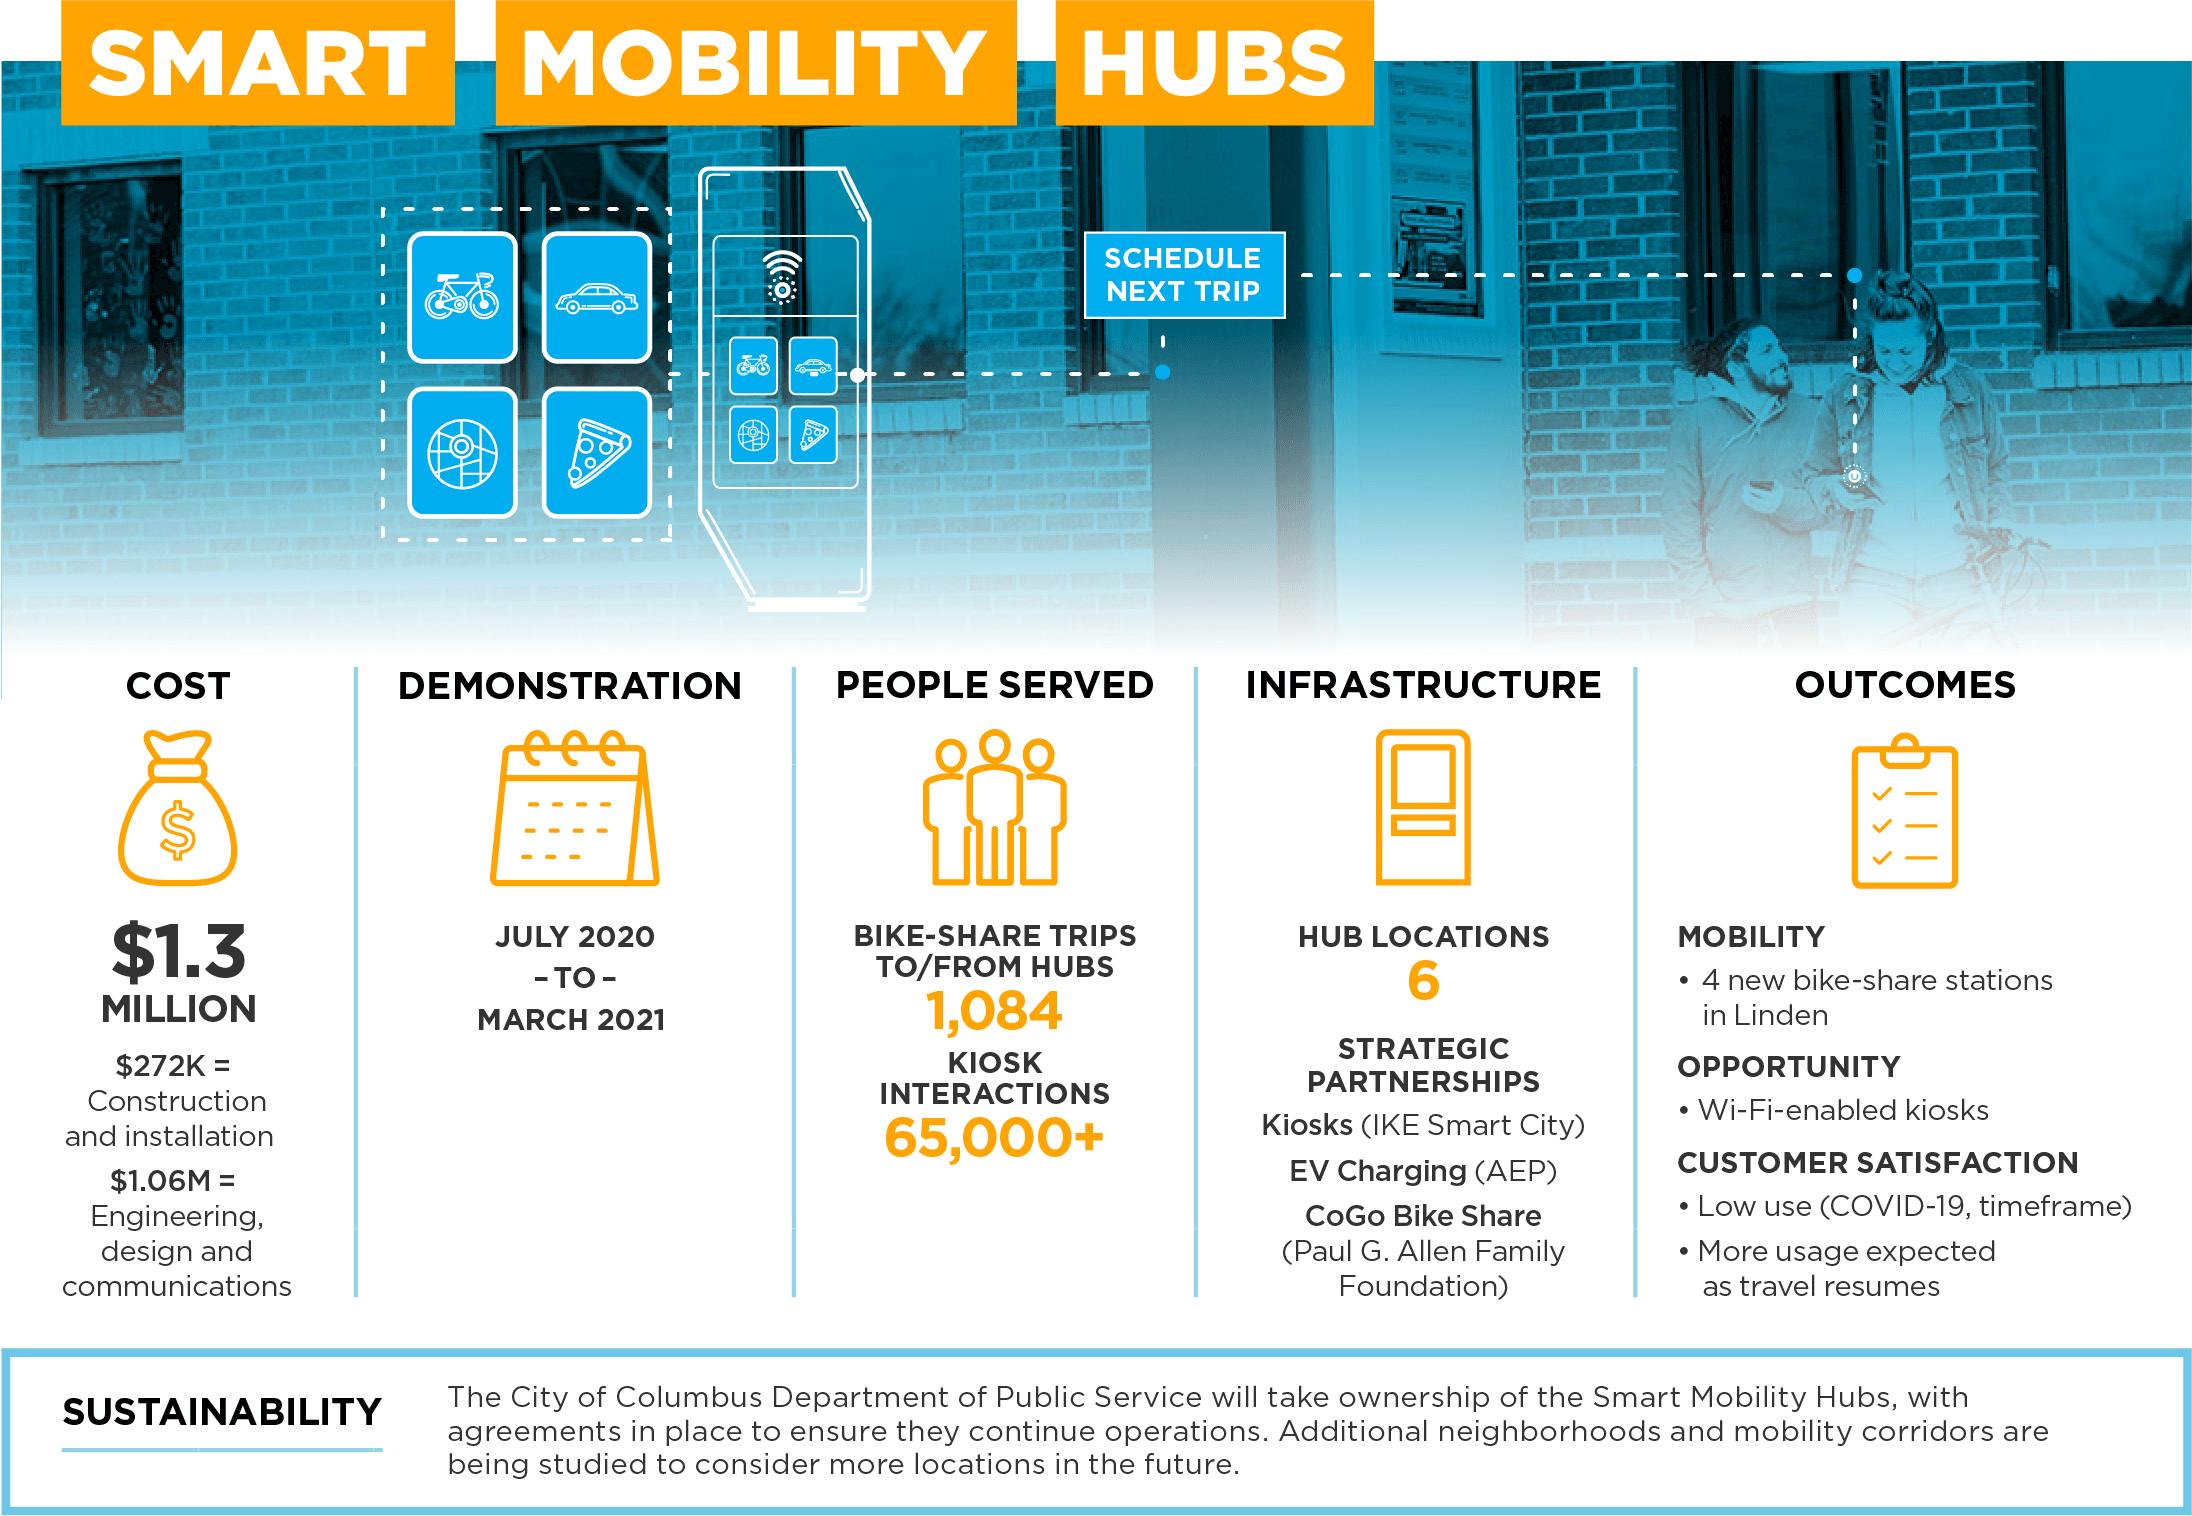 Smart Mobility Hubs